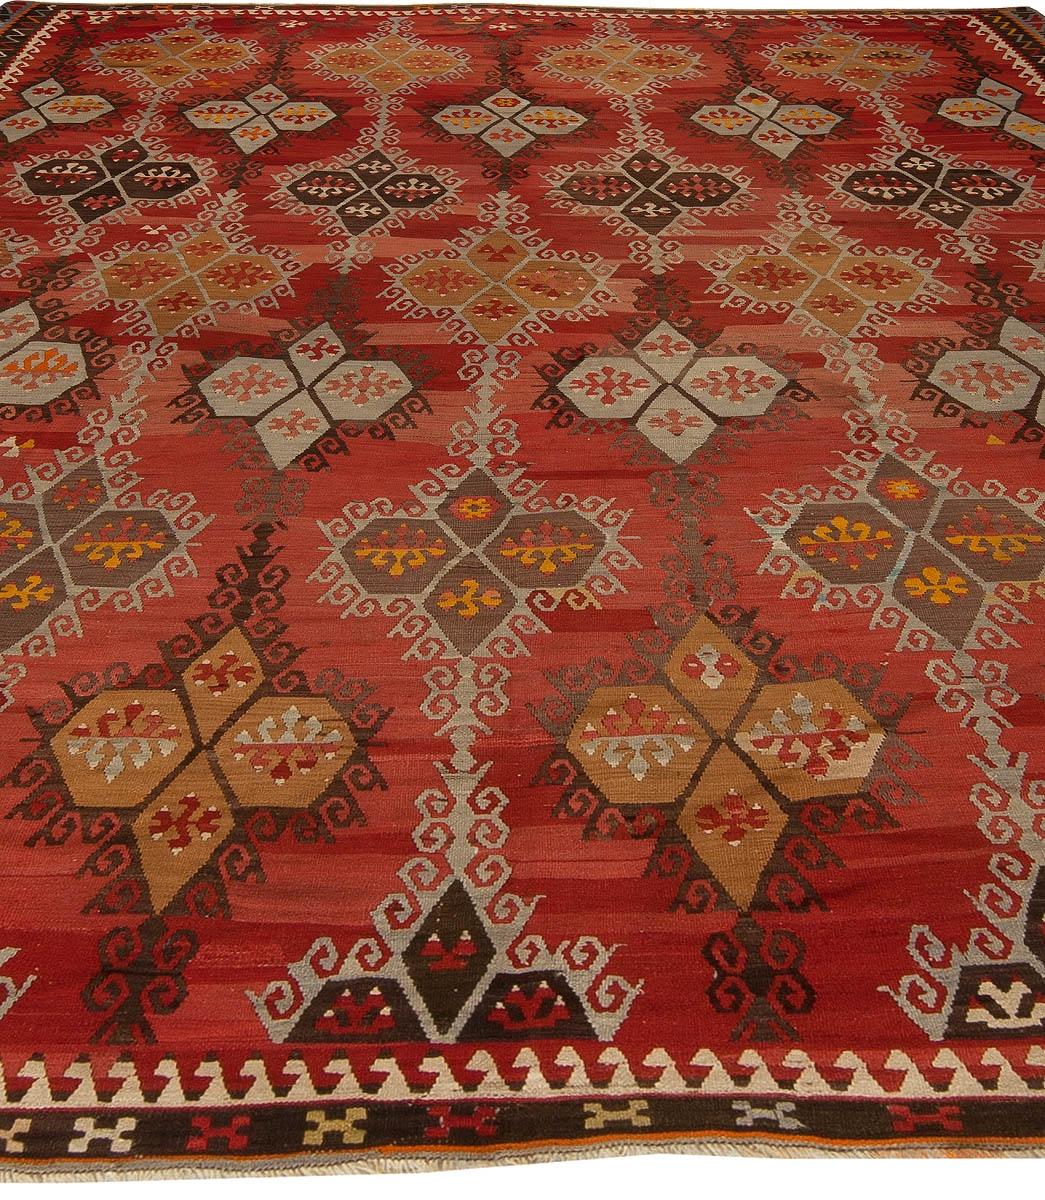 Antique Turkish Kilim Rug Bb5428 Doris Leslie Blau For Kilim Rugs (Image 4 of 15)